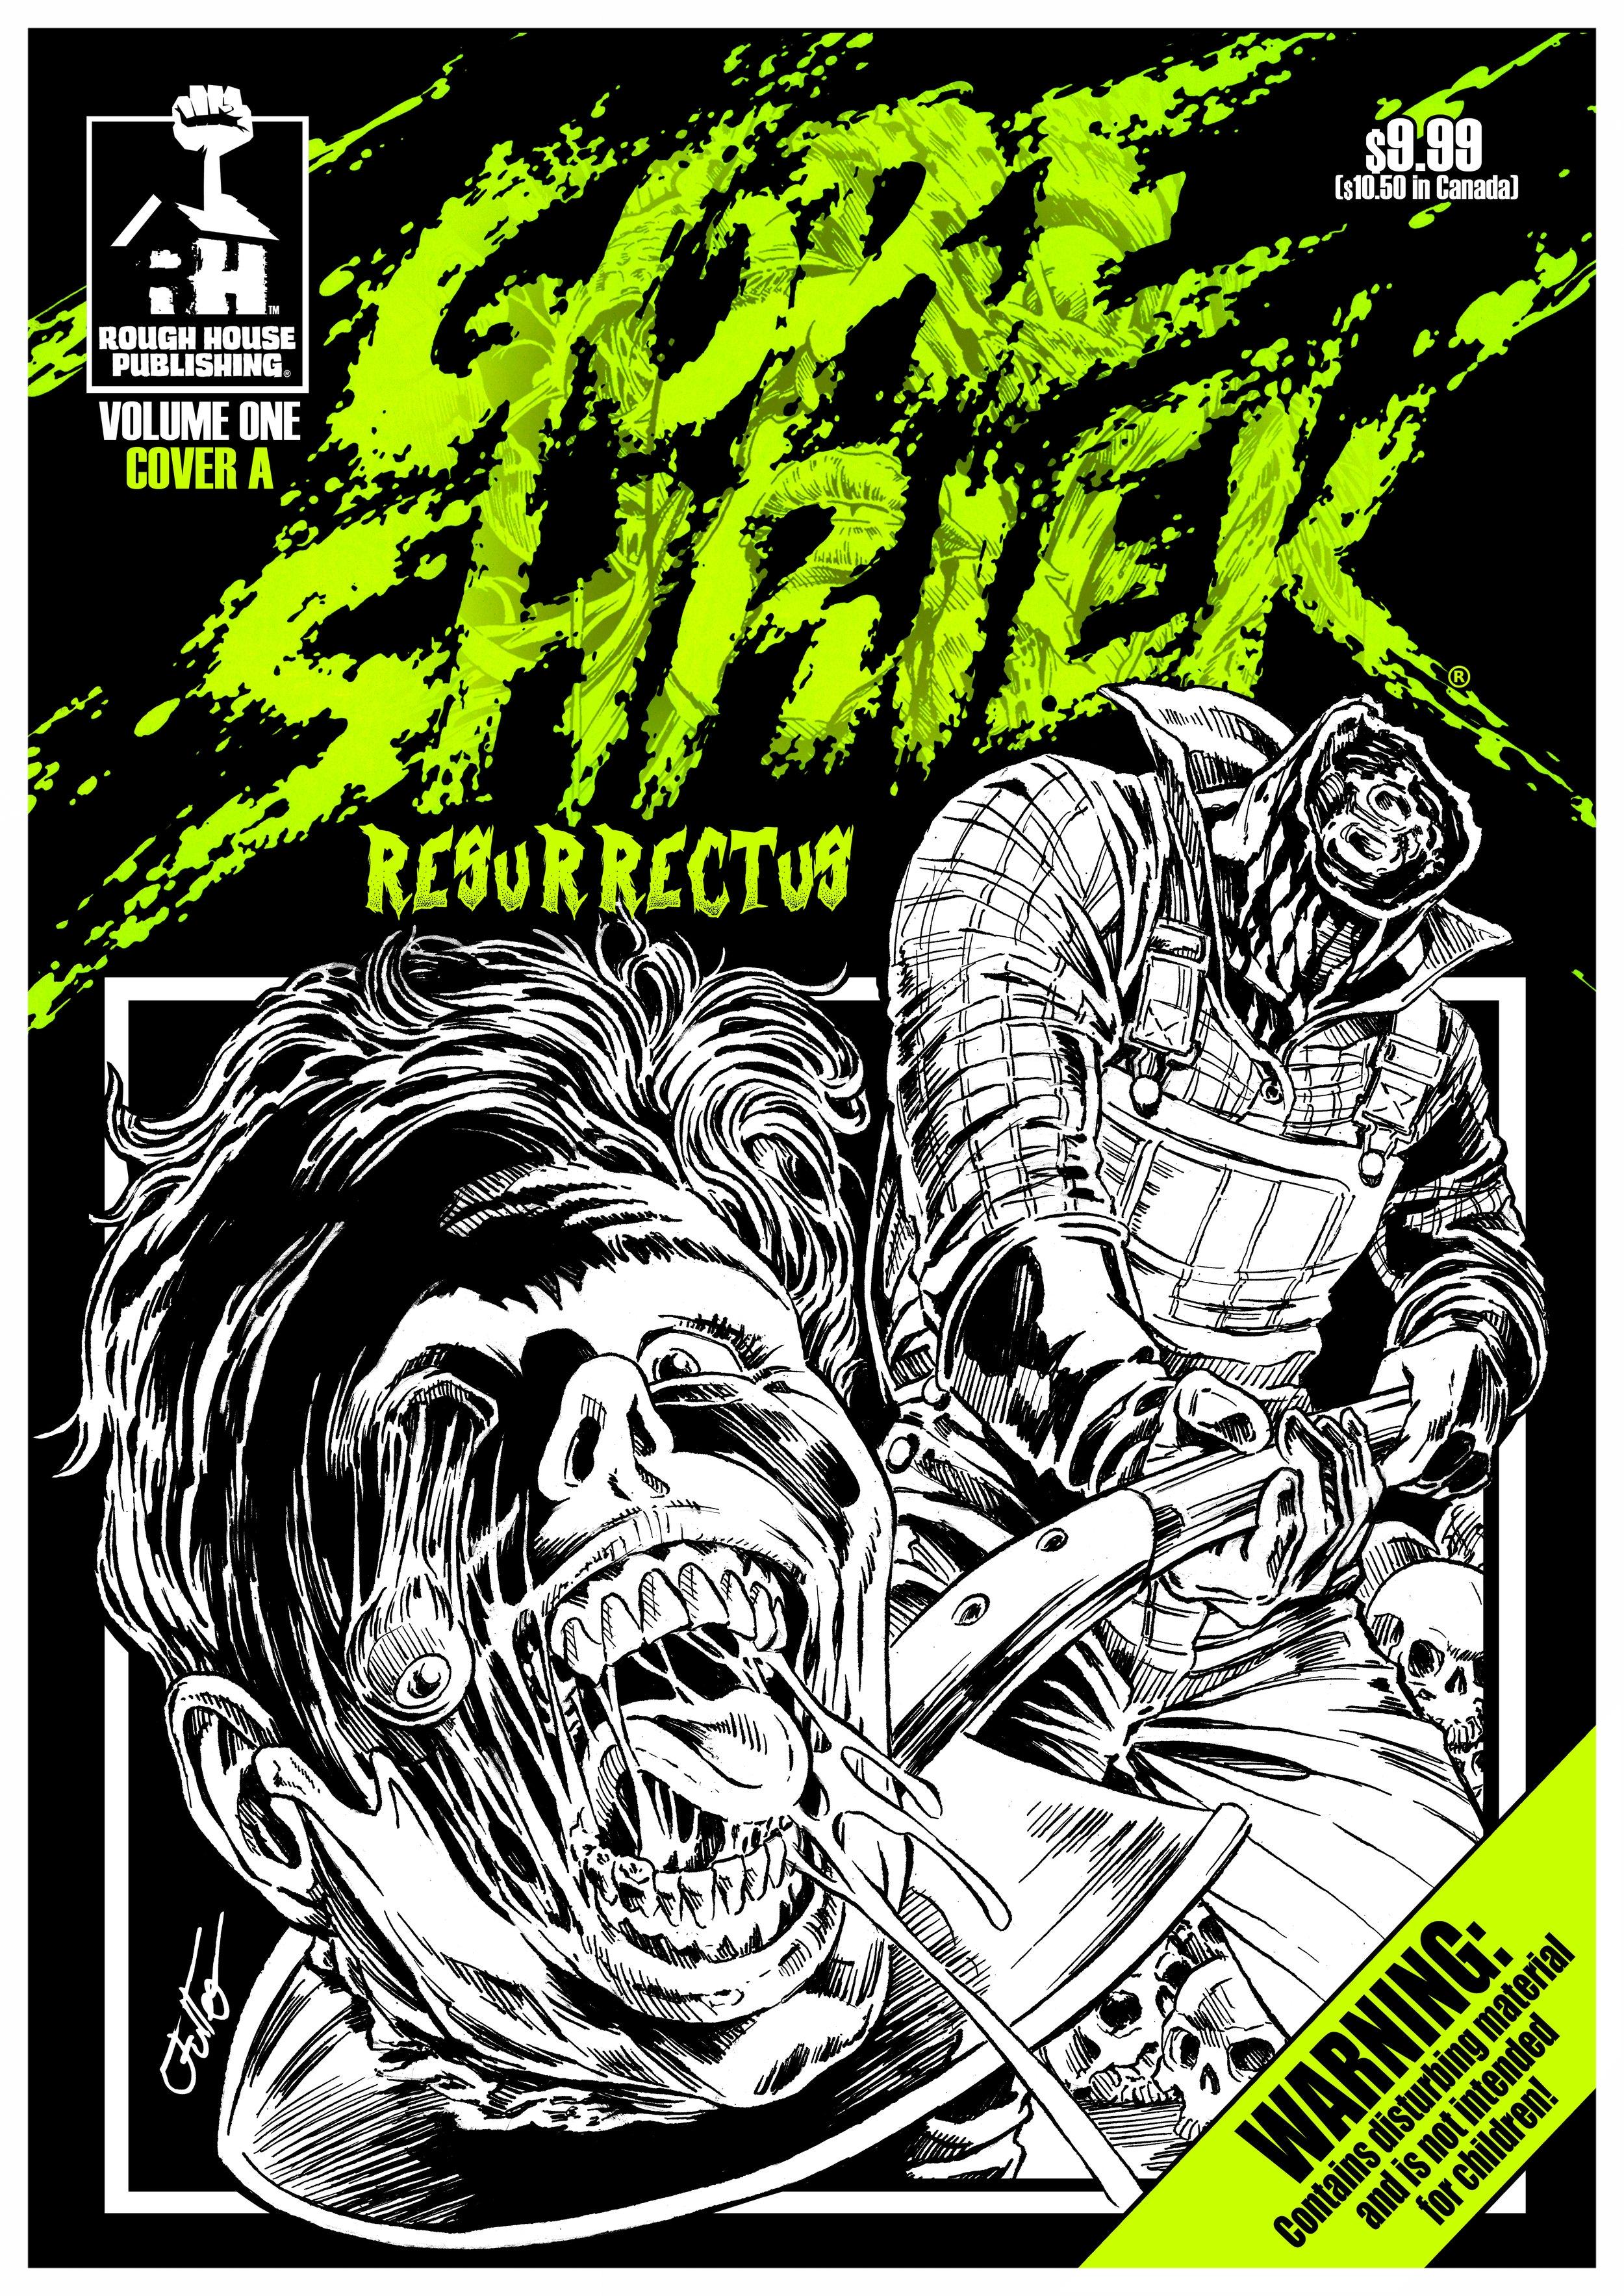 FRONT COVER GORE SHRIEK RESURRECTUS